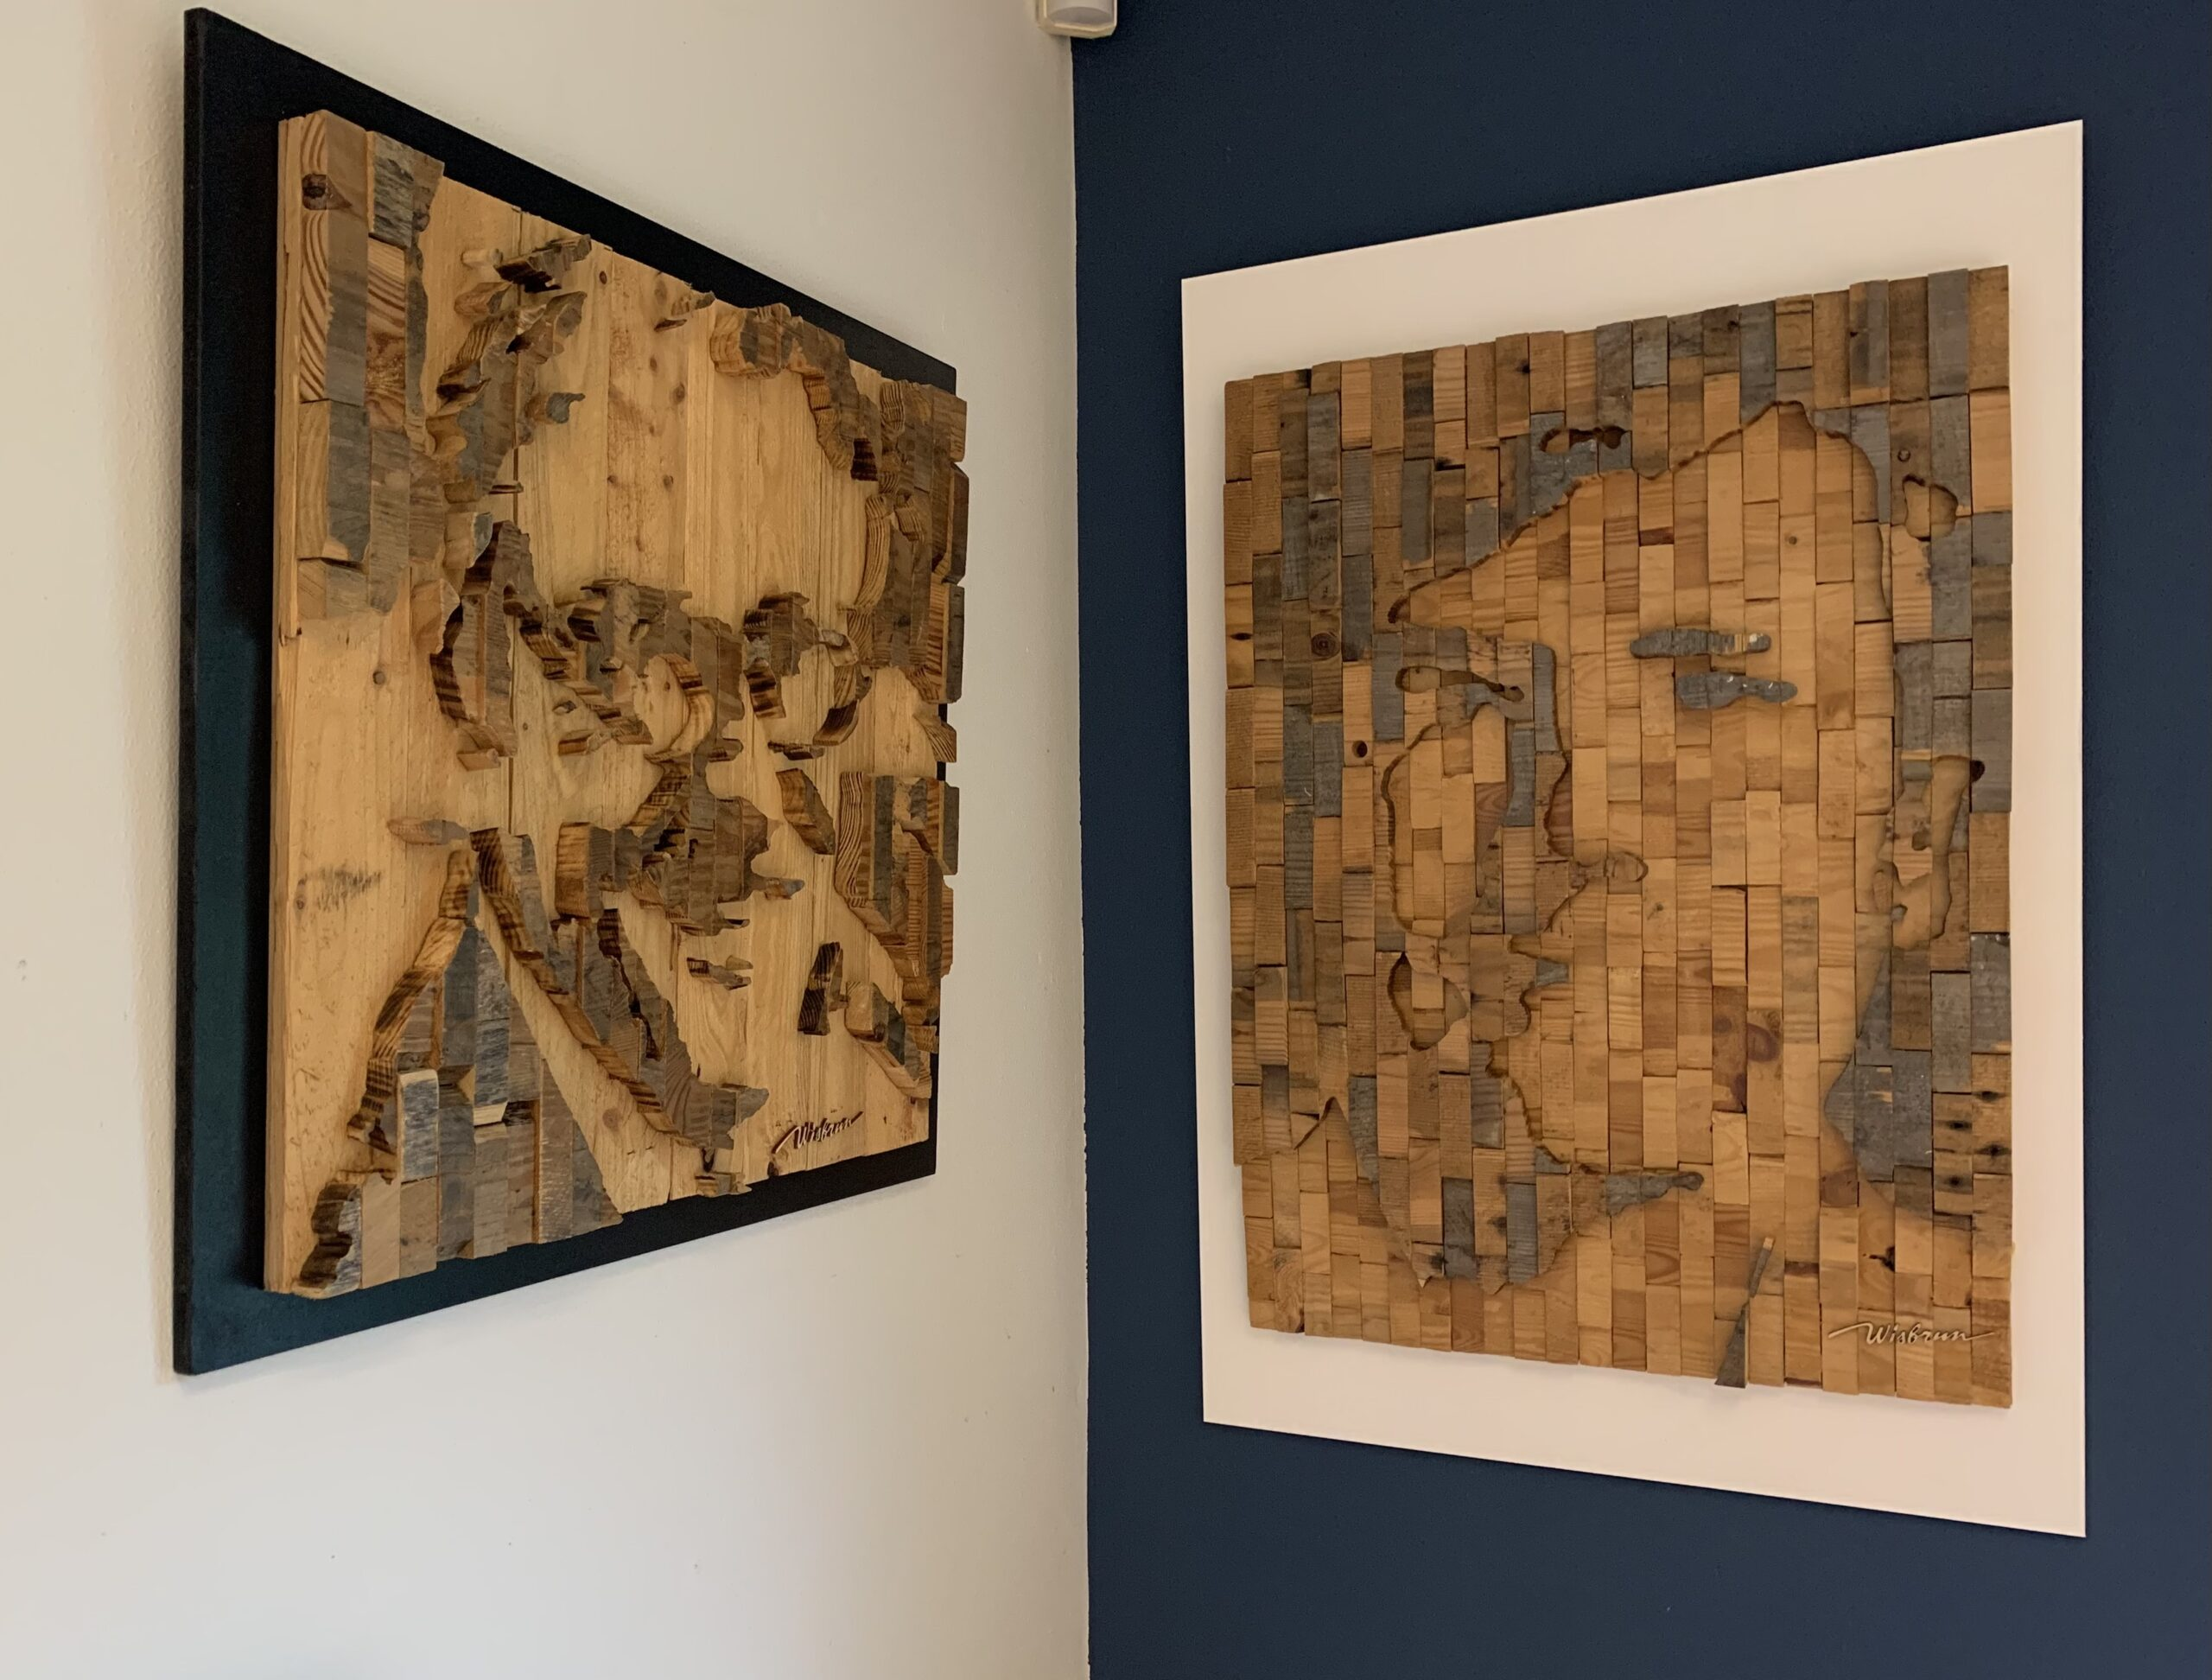 Portret Jeroen Krabbé en Koning Willem Alexander